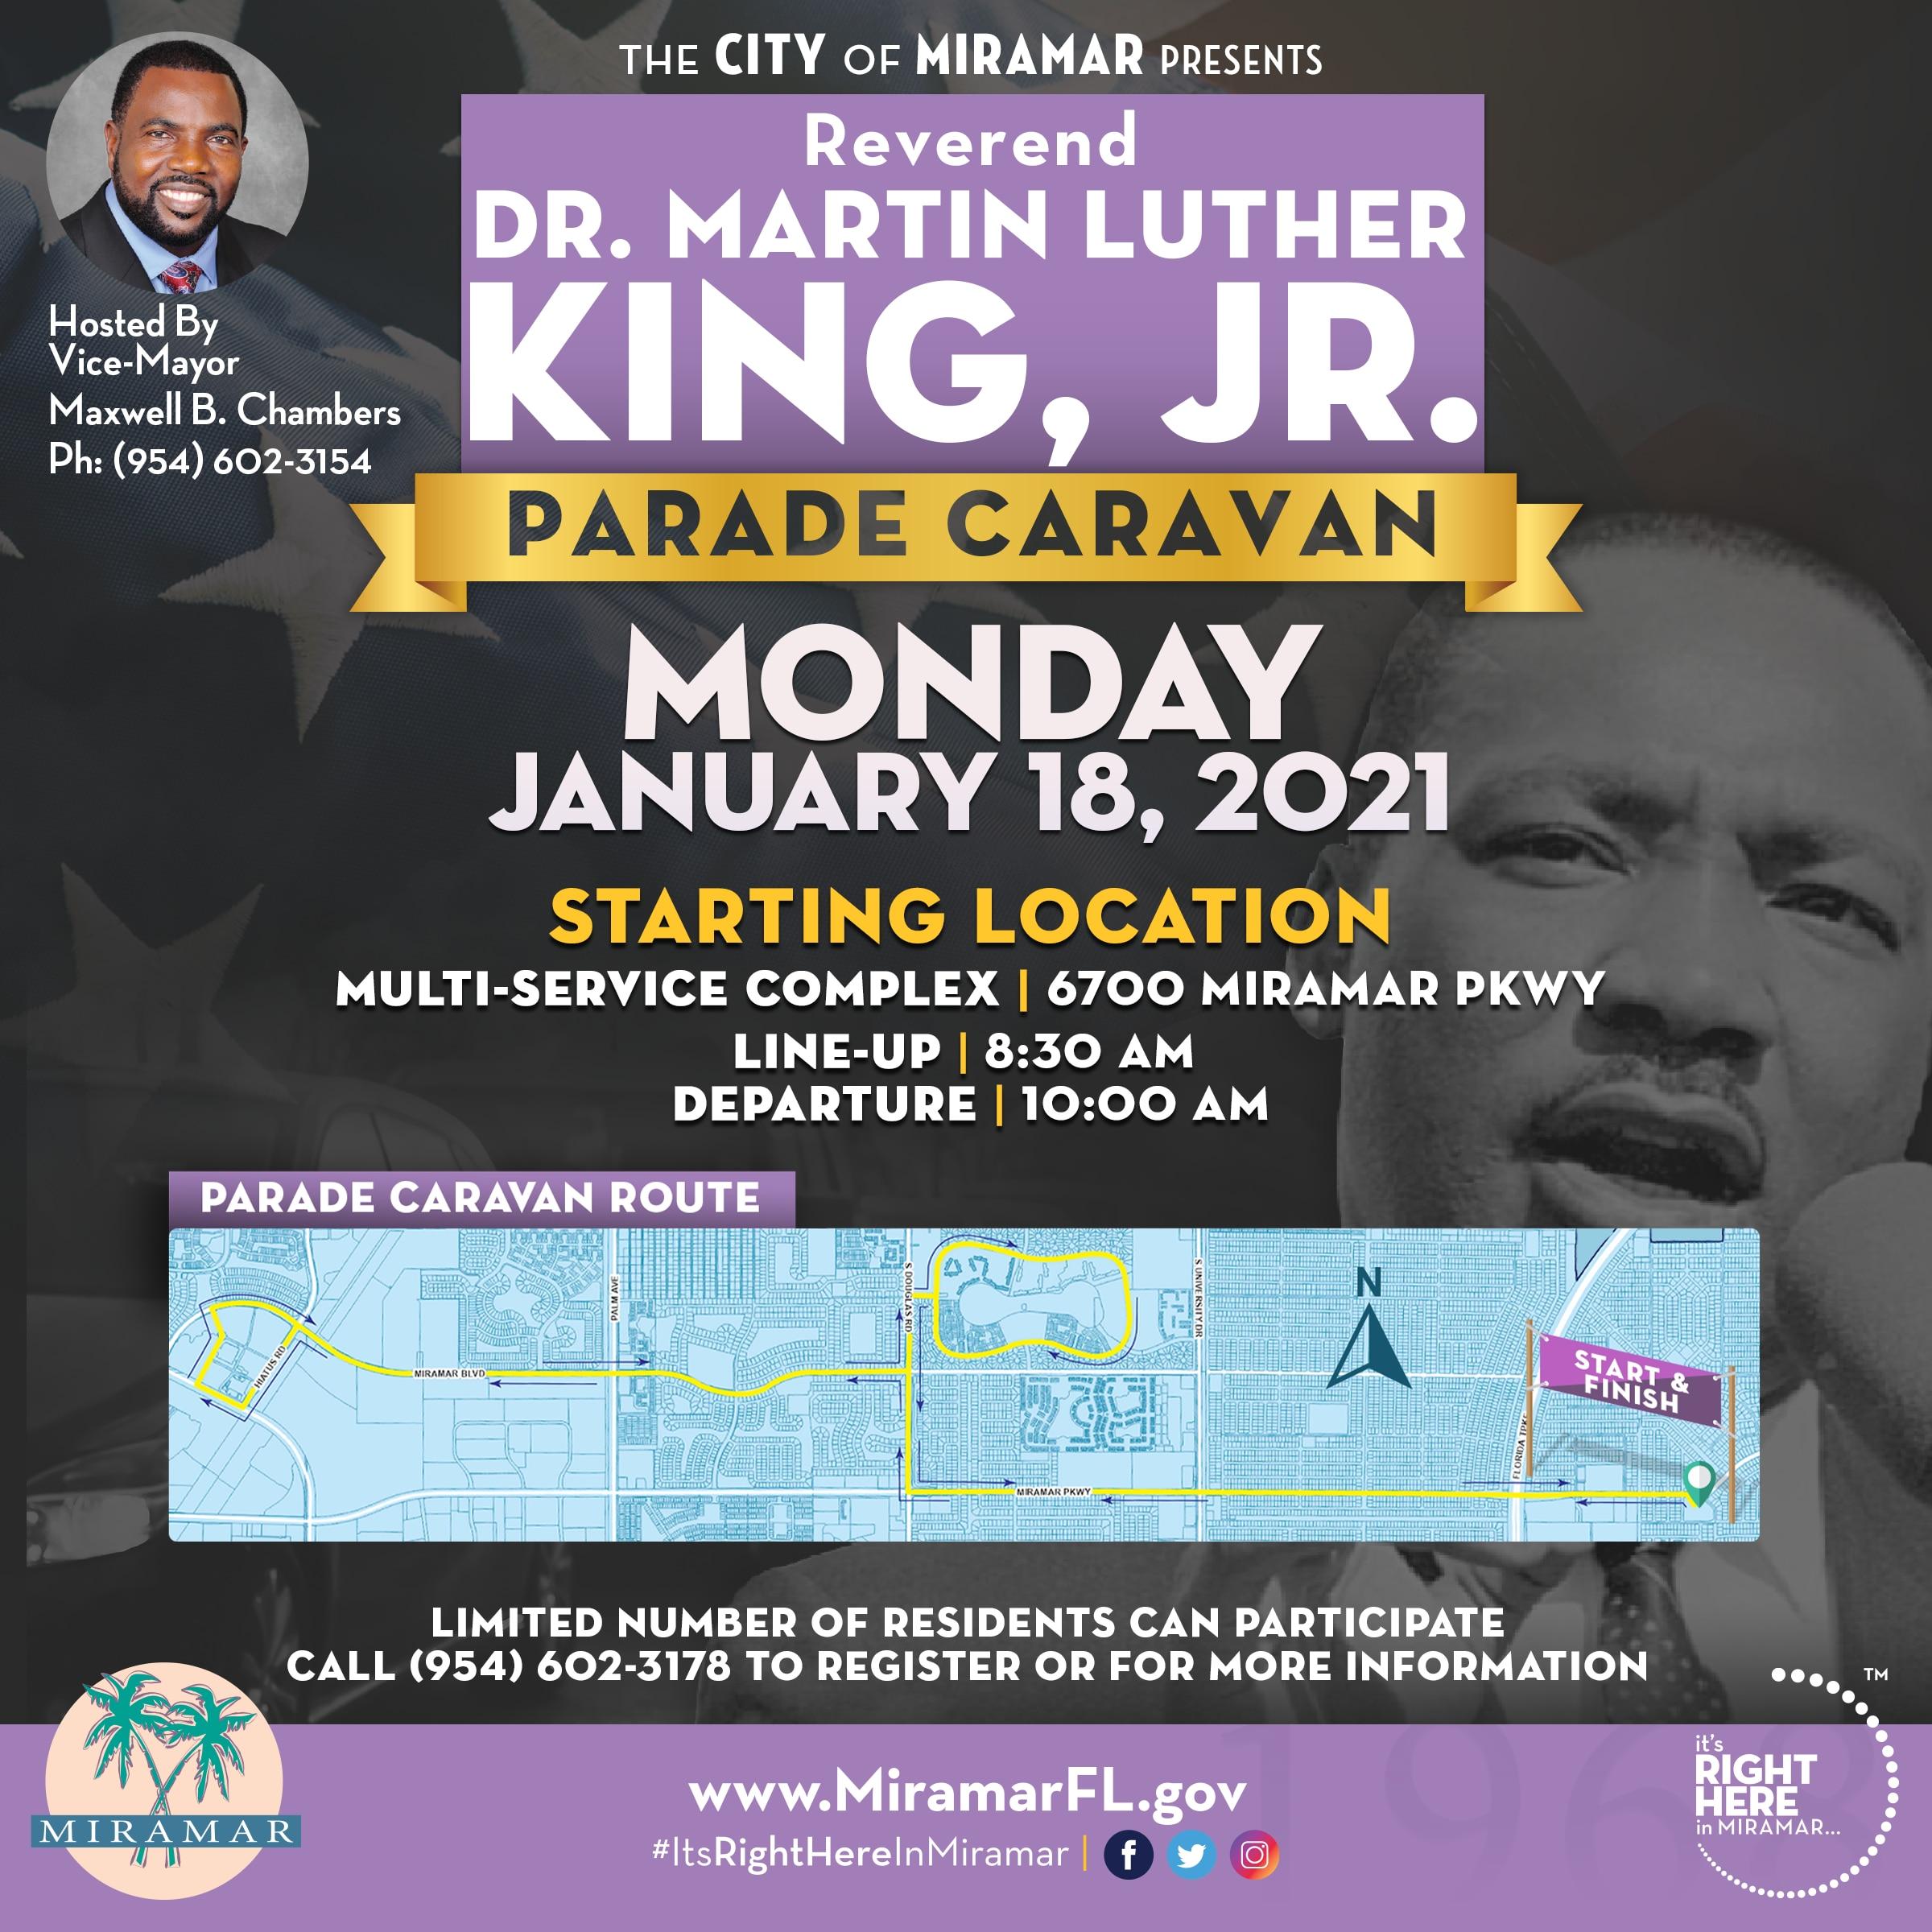 Miramar to hold Martin Luther King parade caravan Monday